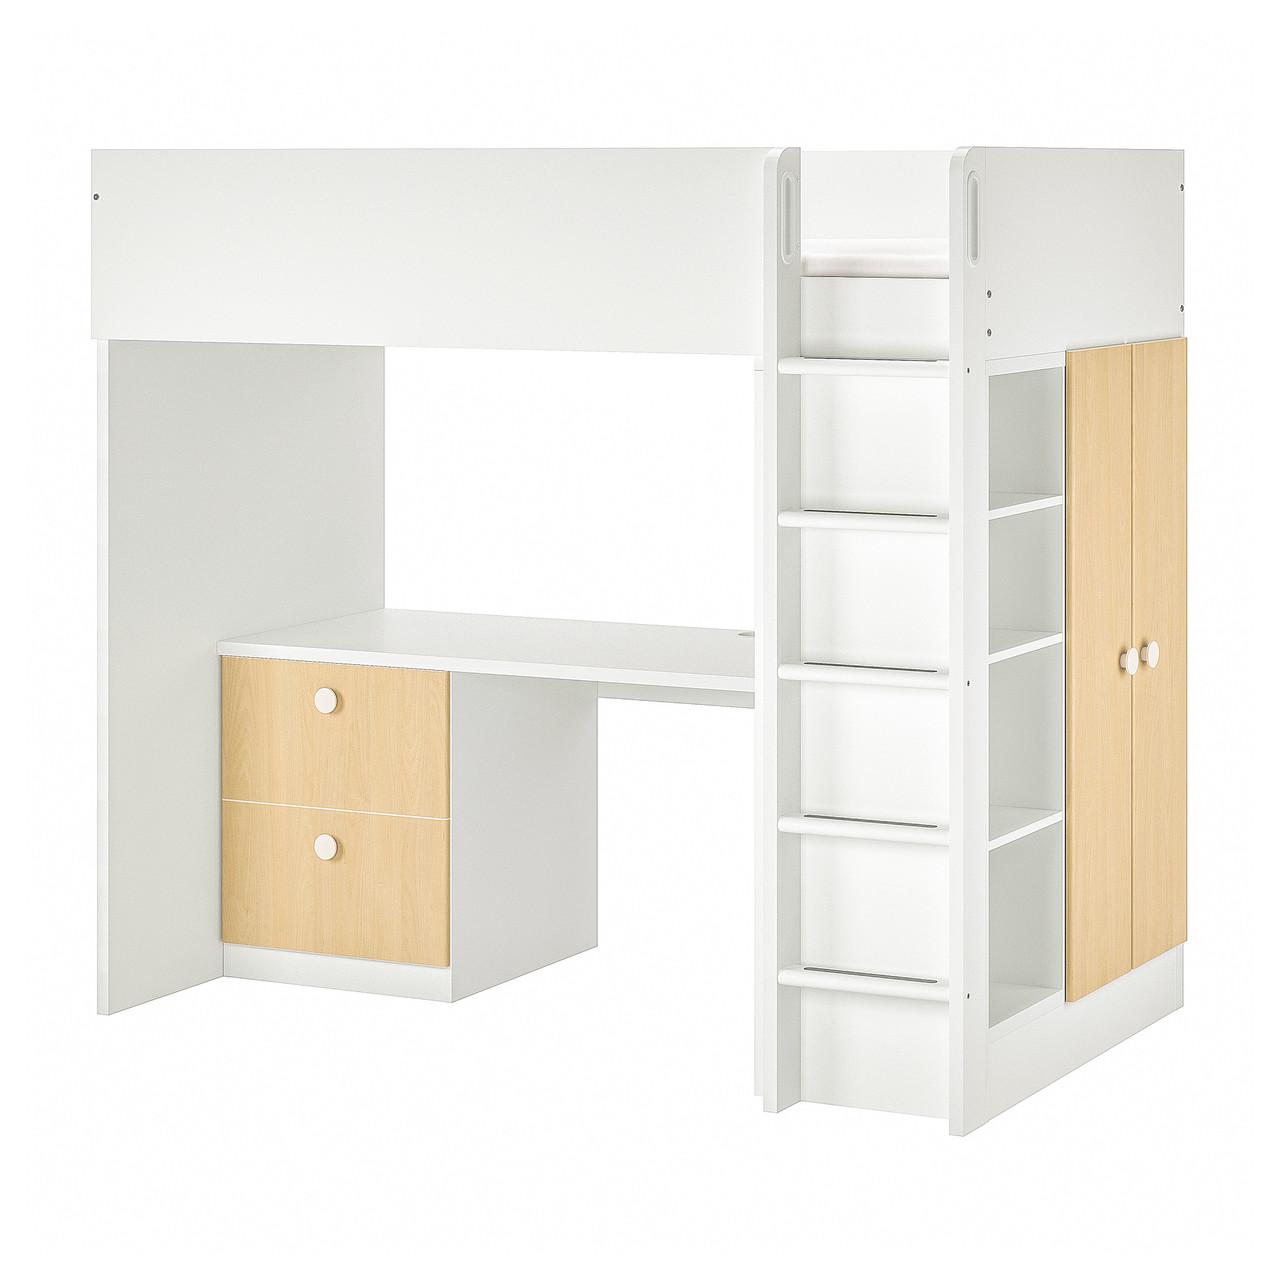 IKEA Кровать-чердак STUVA / FÖLJA (993.002.69)